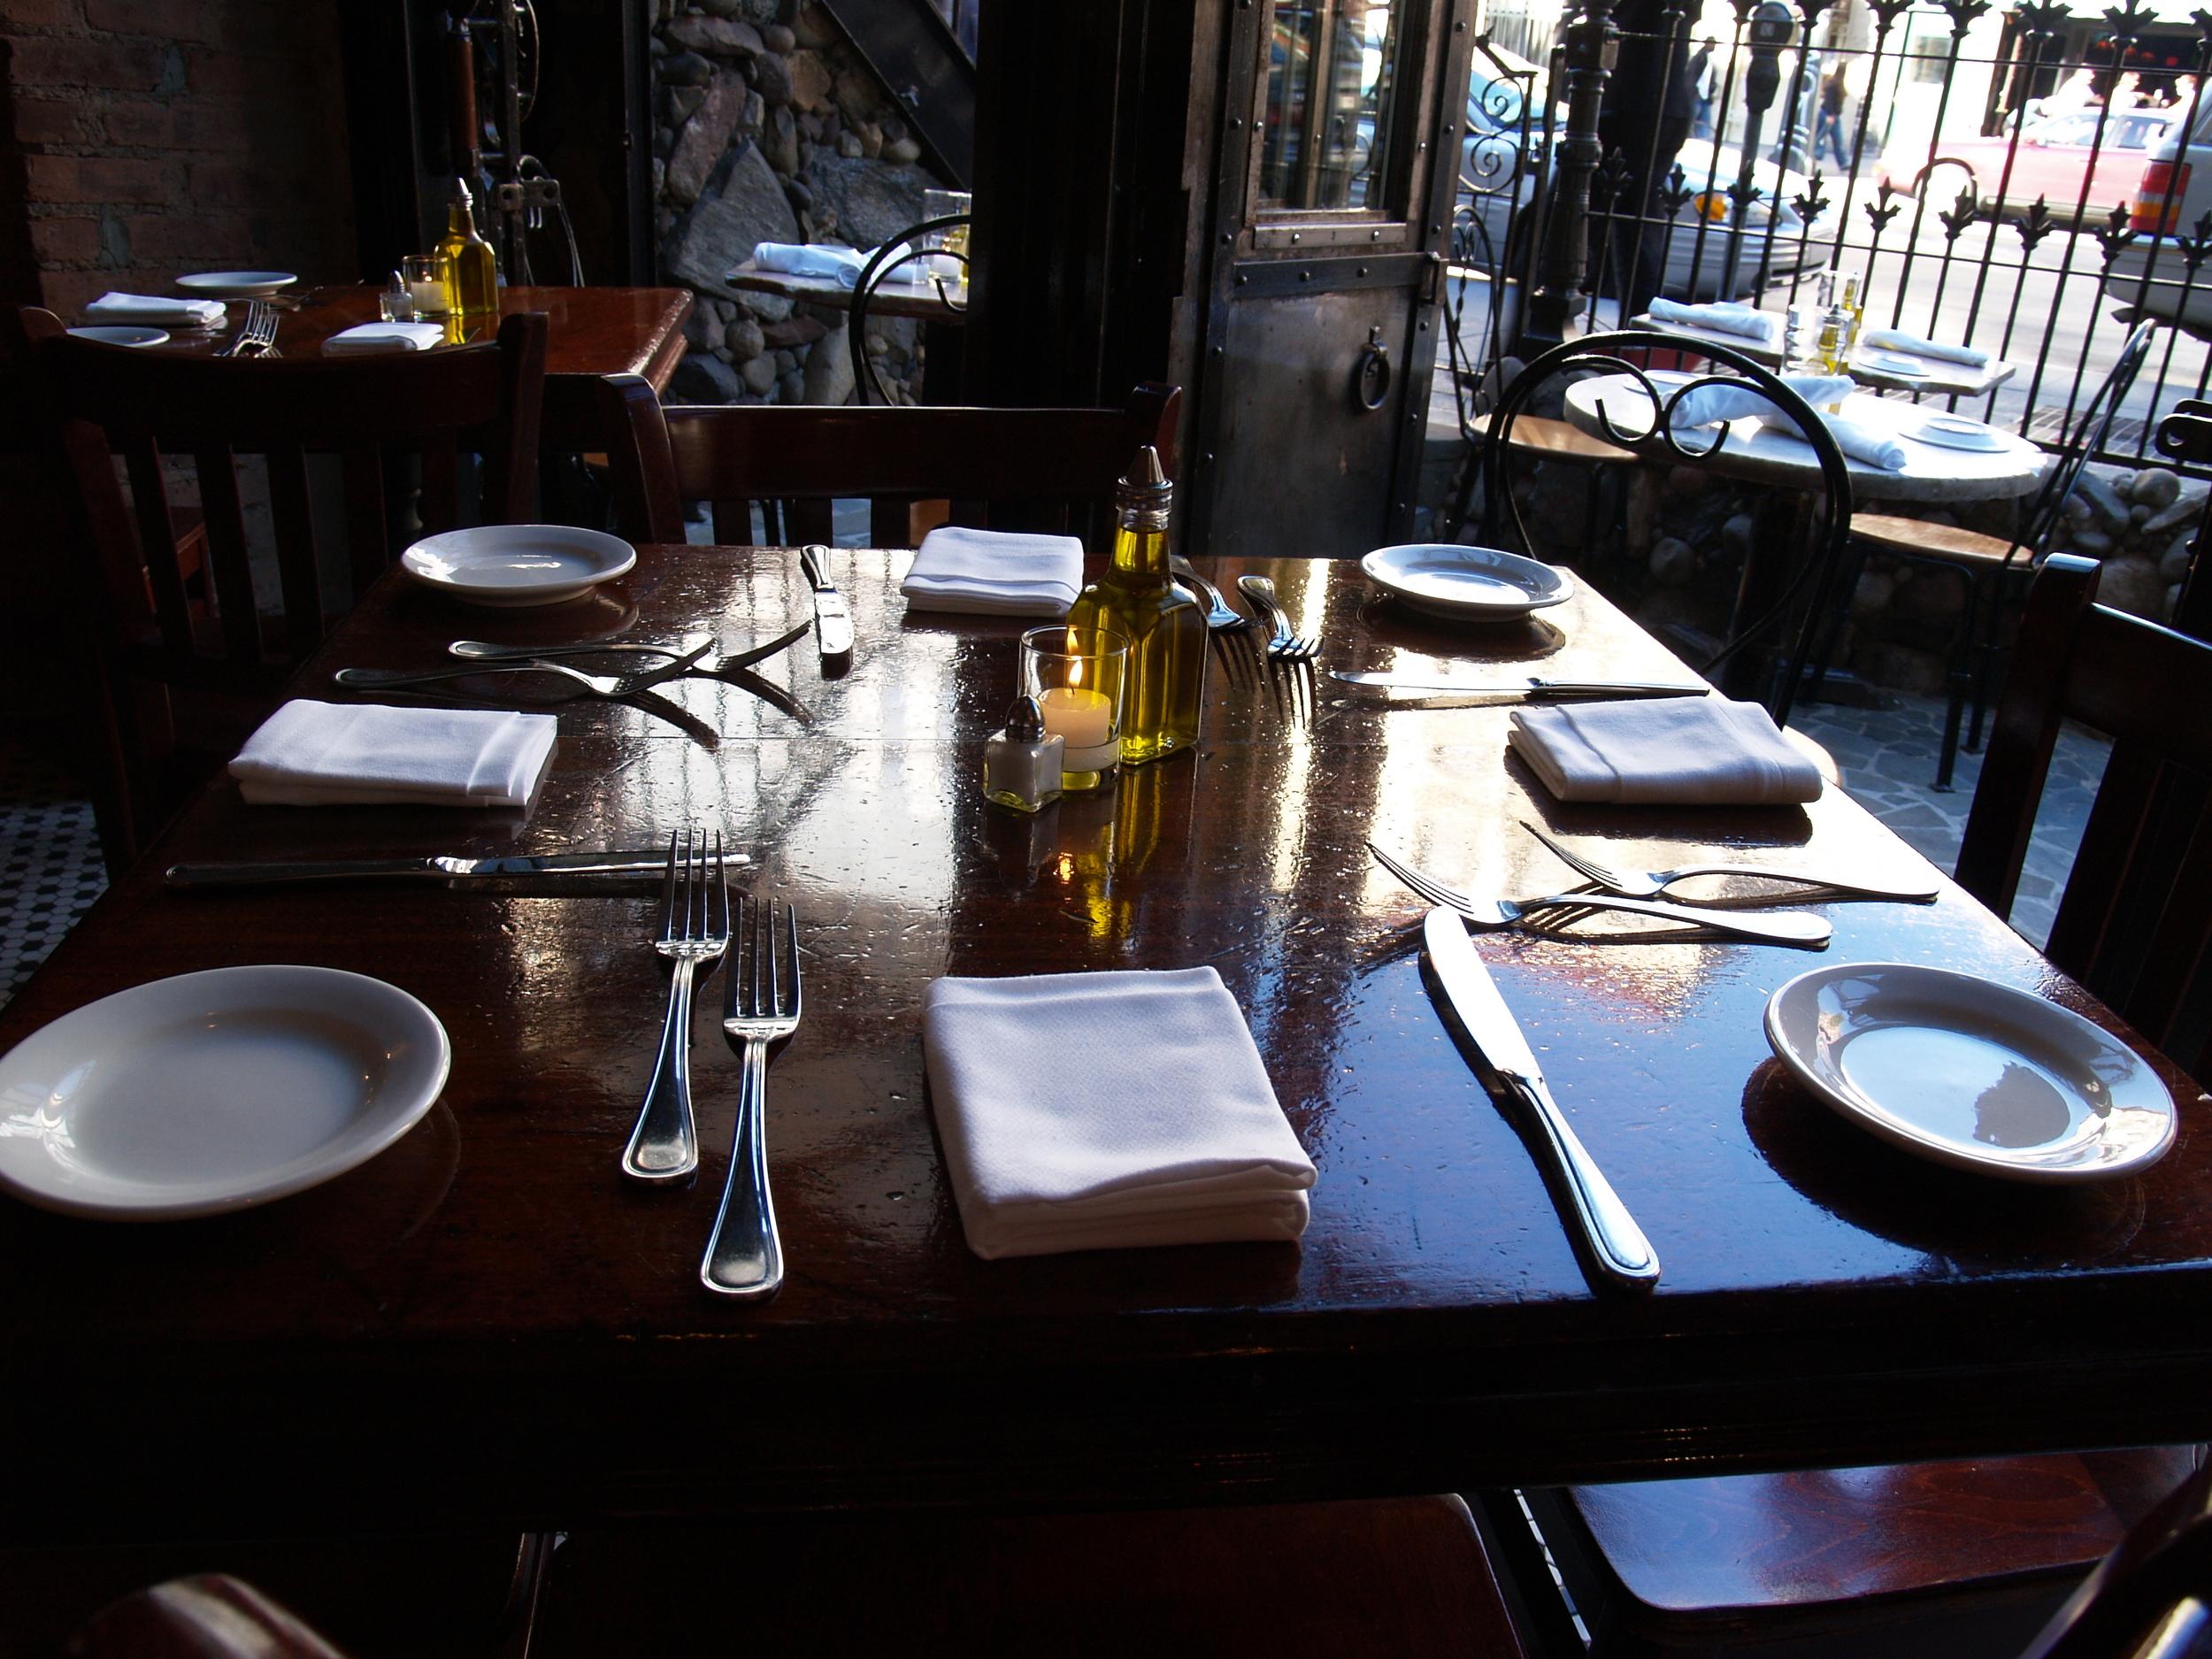 Crispo - Family table north port menu